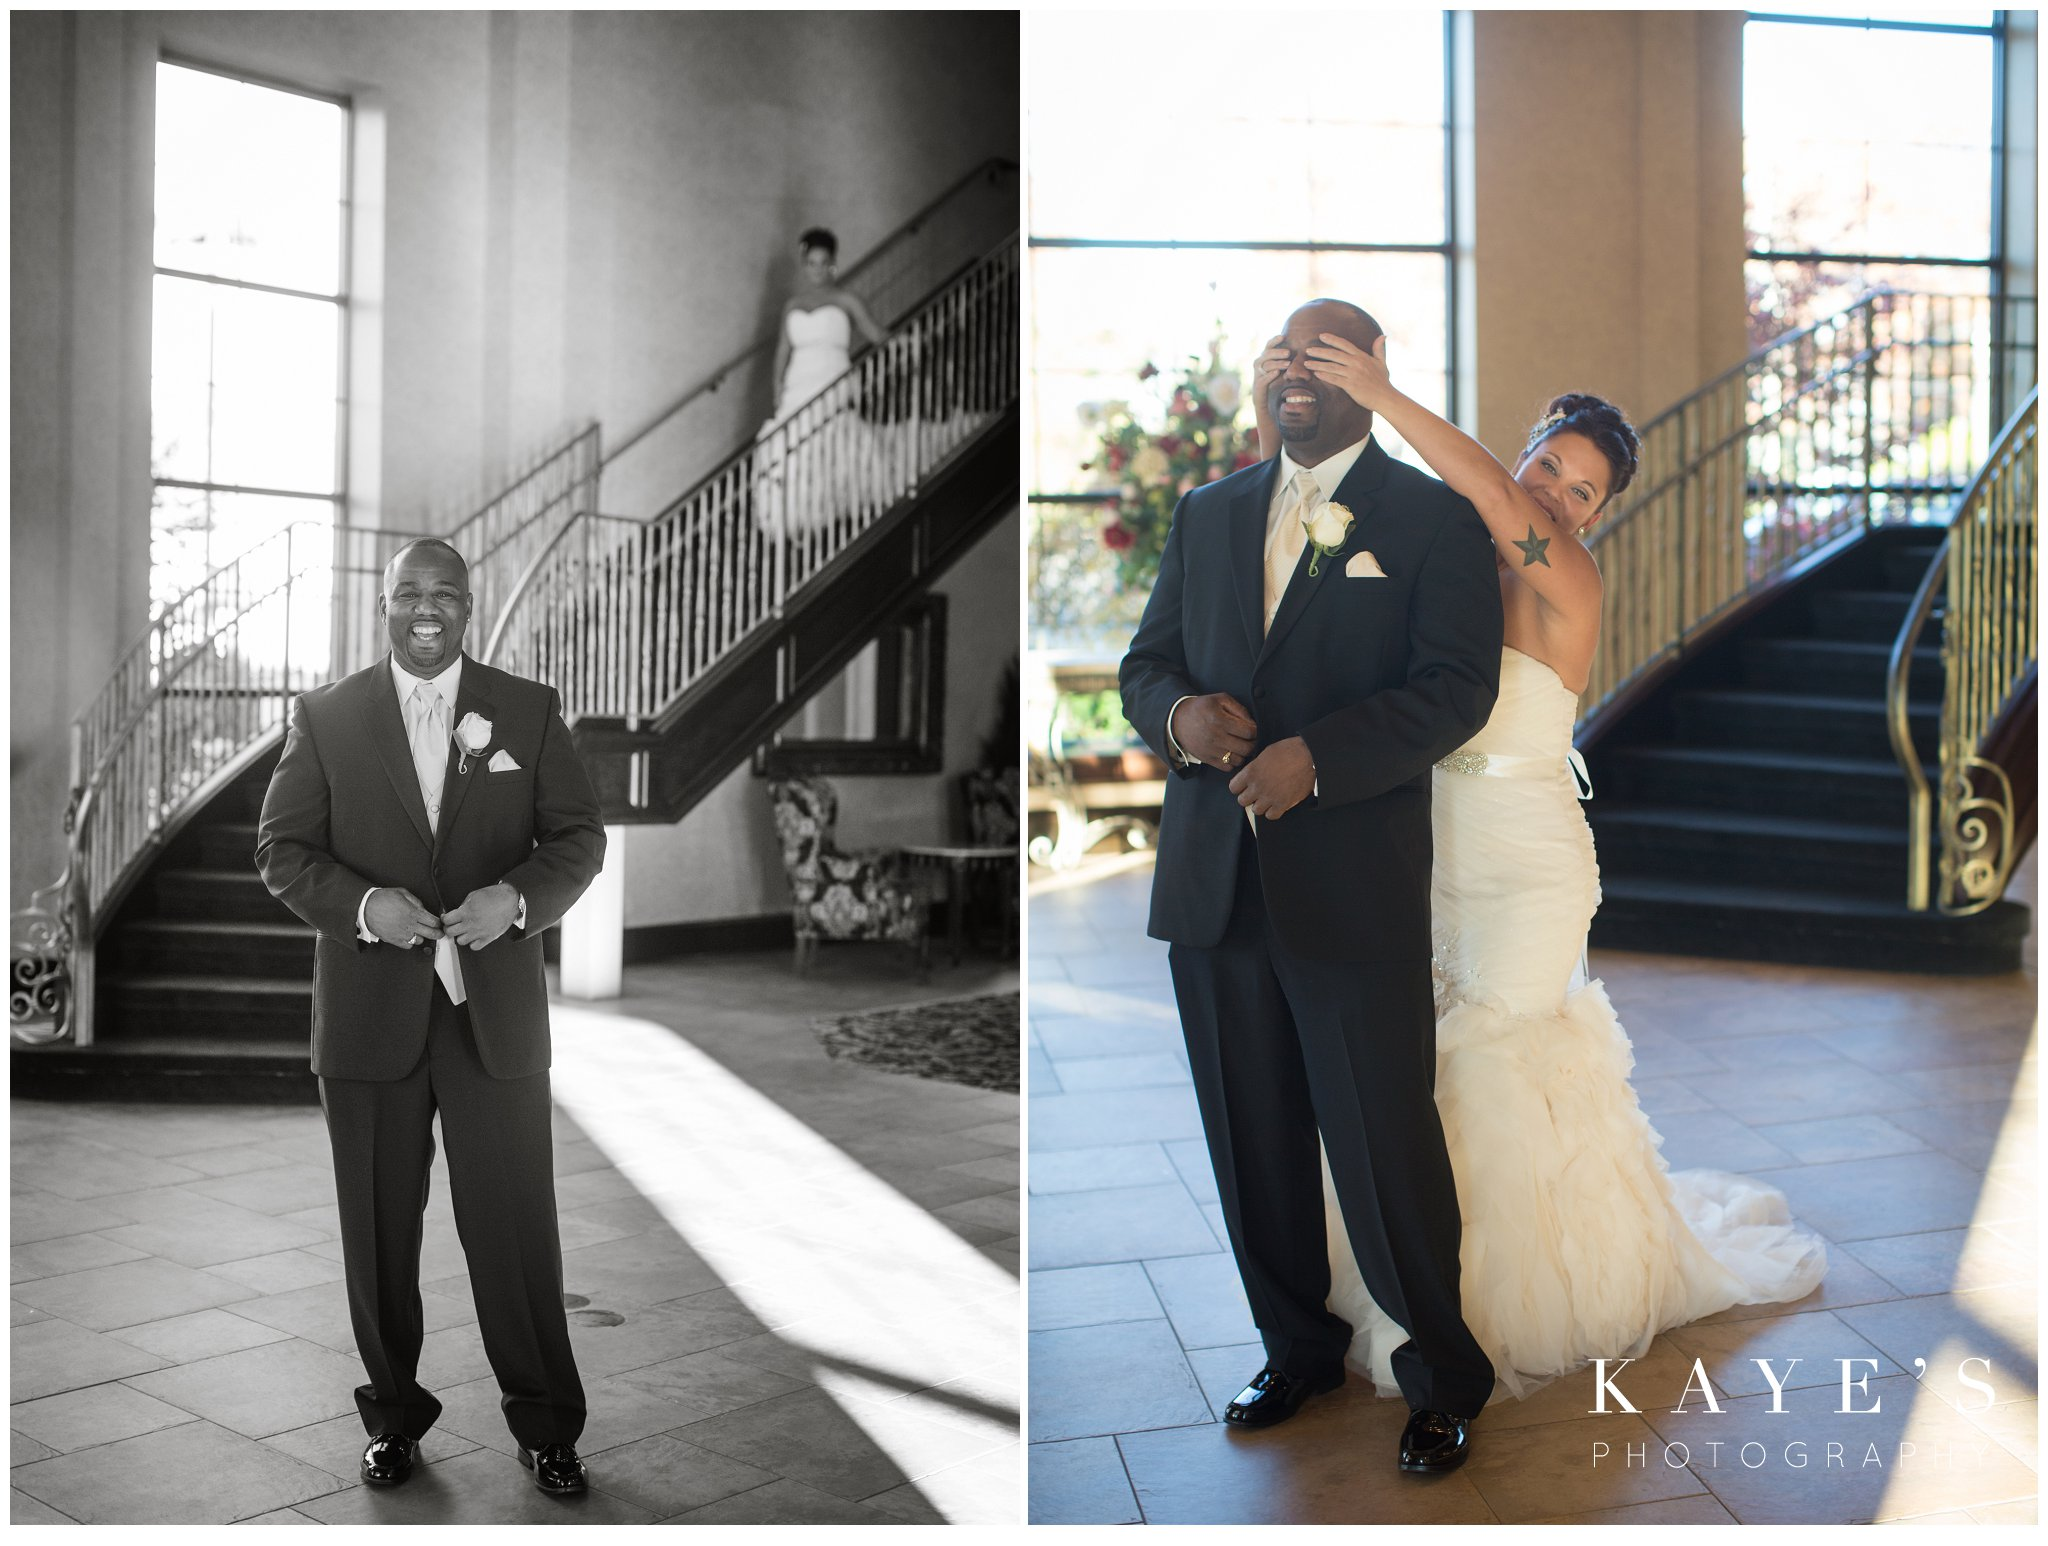 Howell Michigan Wedding photographer, engagement photos photography wedding best photographers best photo marriage photos best wedding photos wedding portraits